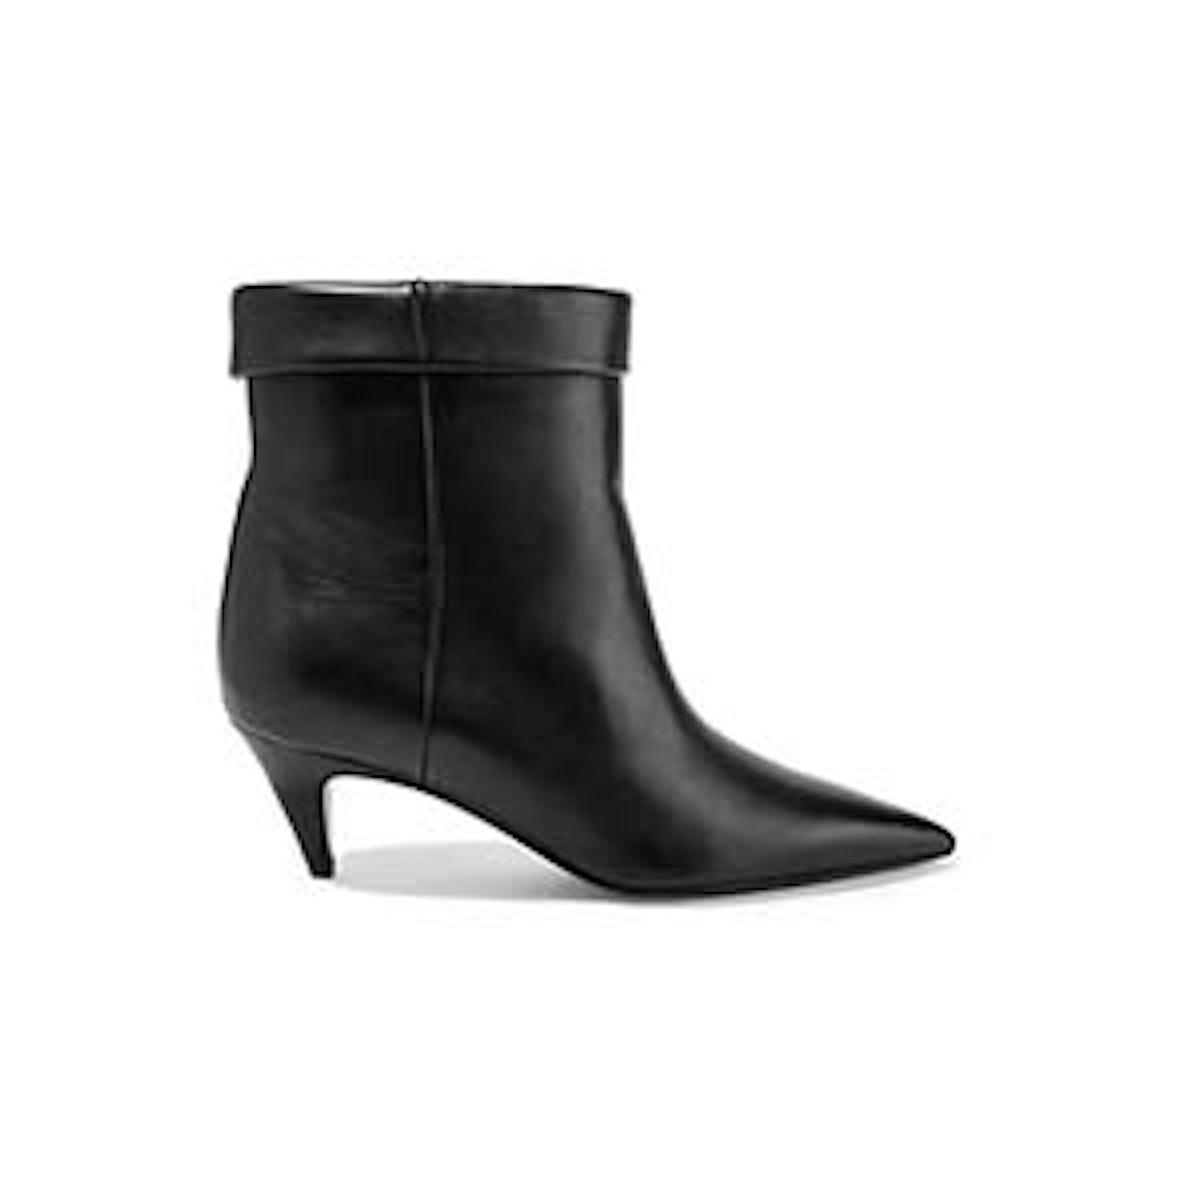 Saint Laurent Charlotte Leather Ankle Boots